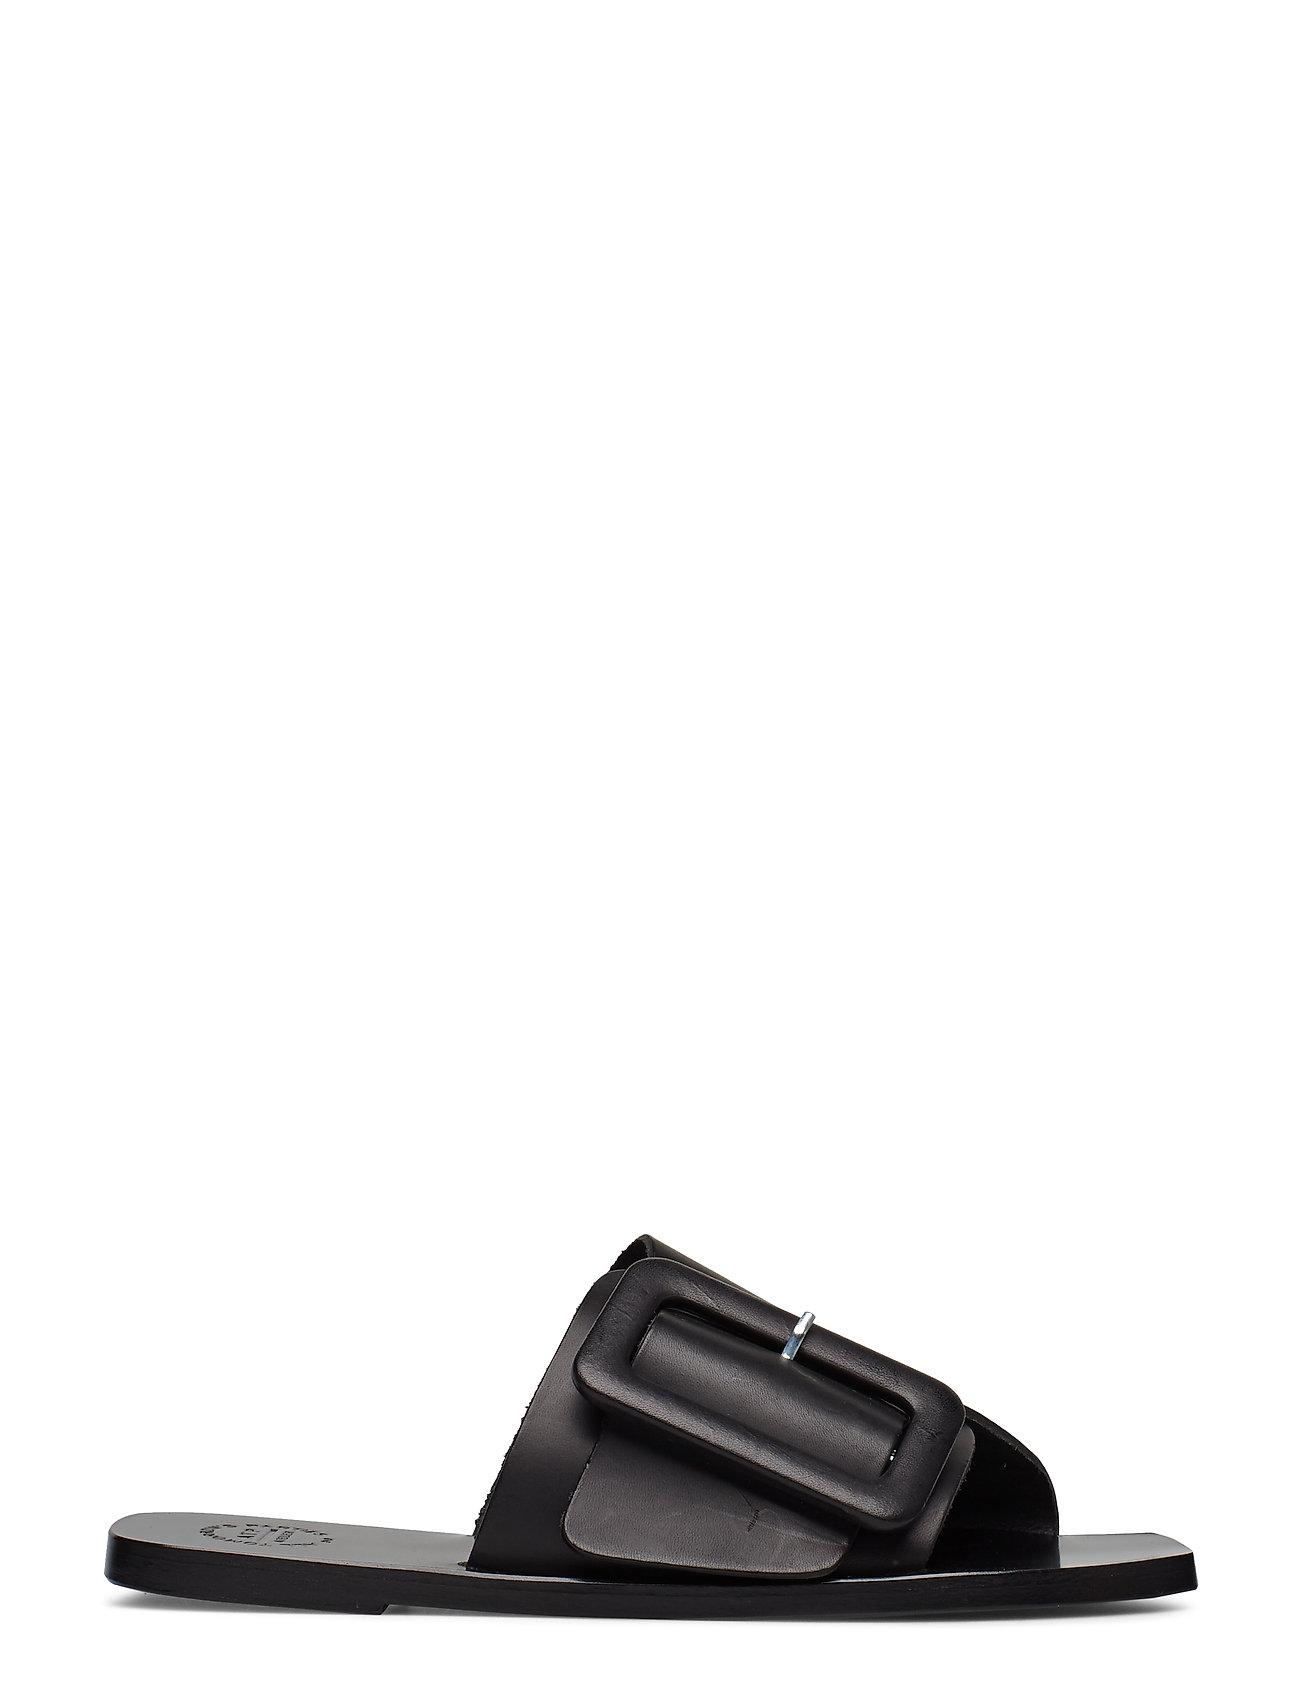 ATP Atelier - Ceci Black Vacchetta - płaskie sandały - black - 1